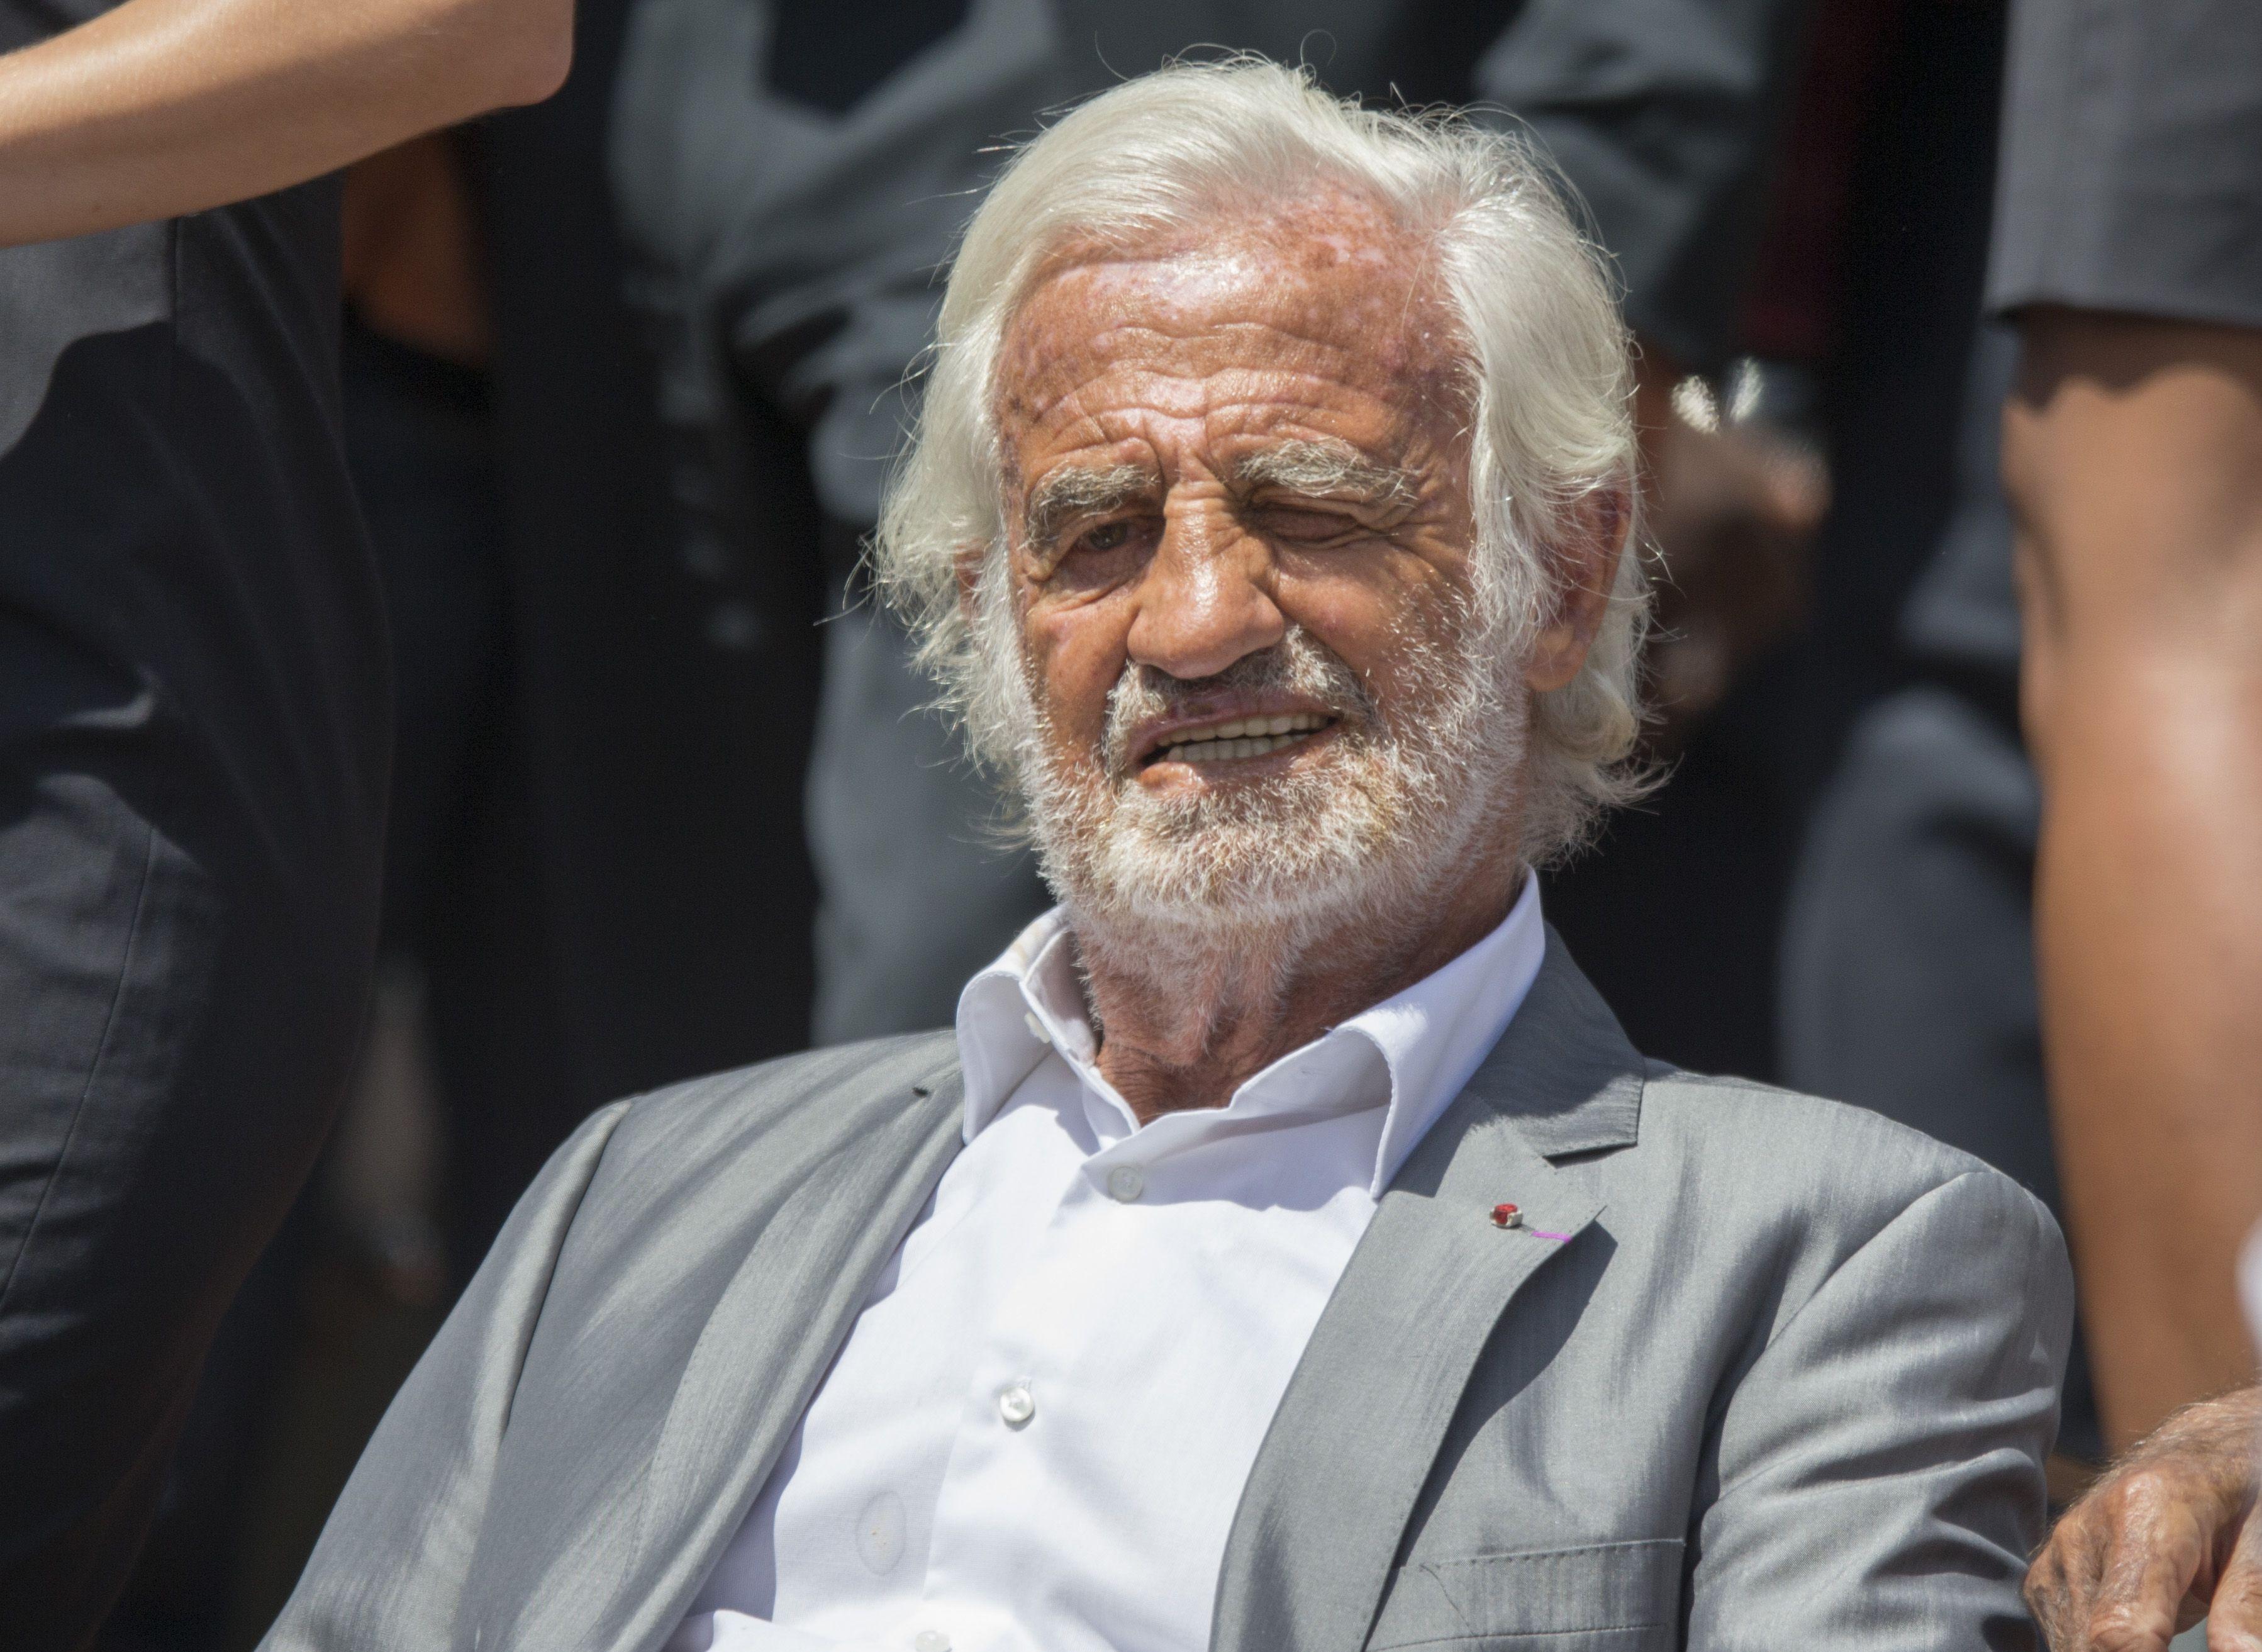 Quel âge A Jean-paul Belmondo : jean-paul, belmondo, Пин, пользователя, Larson, доске, Jean-Paul, Belmondo